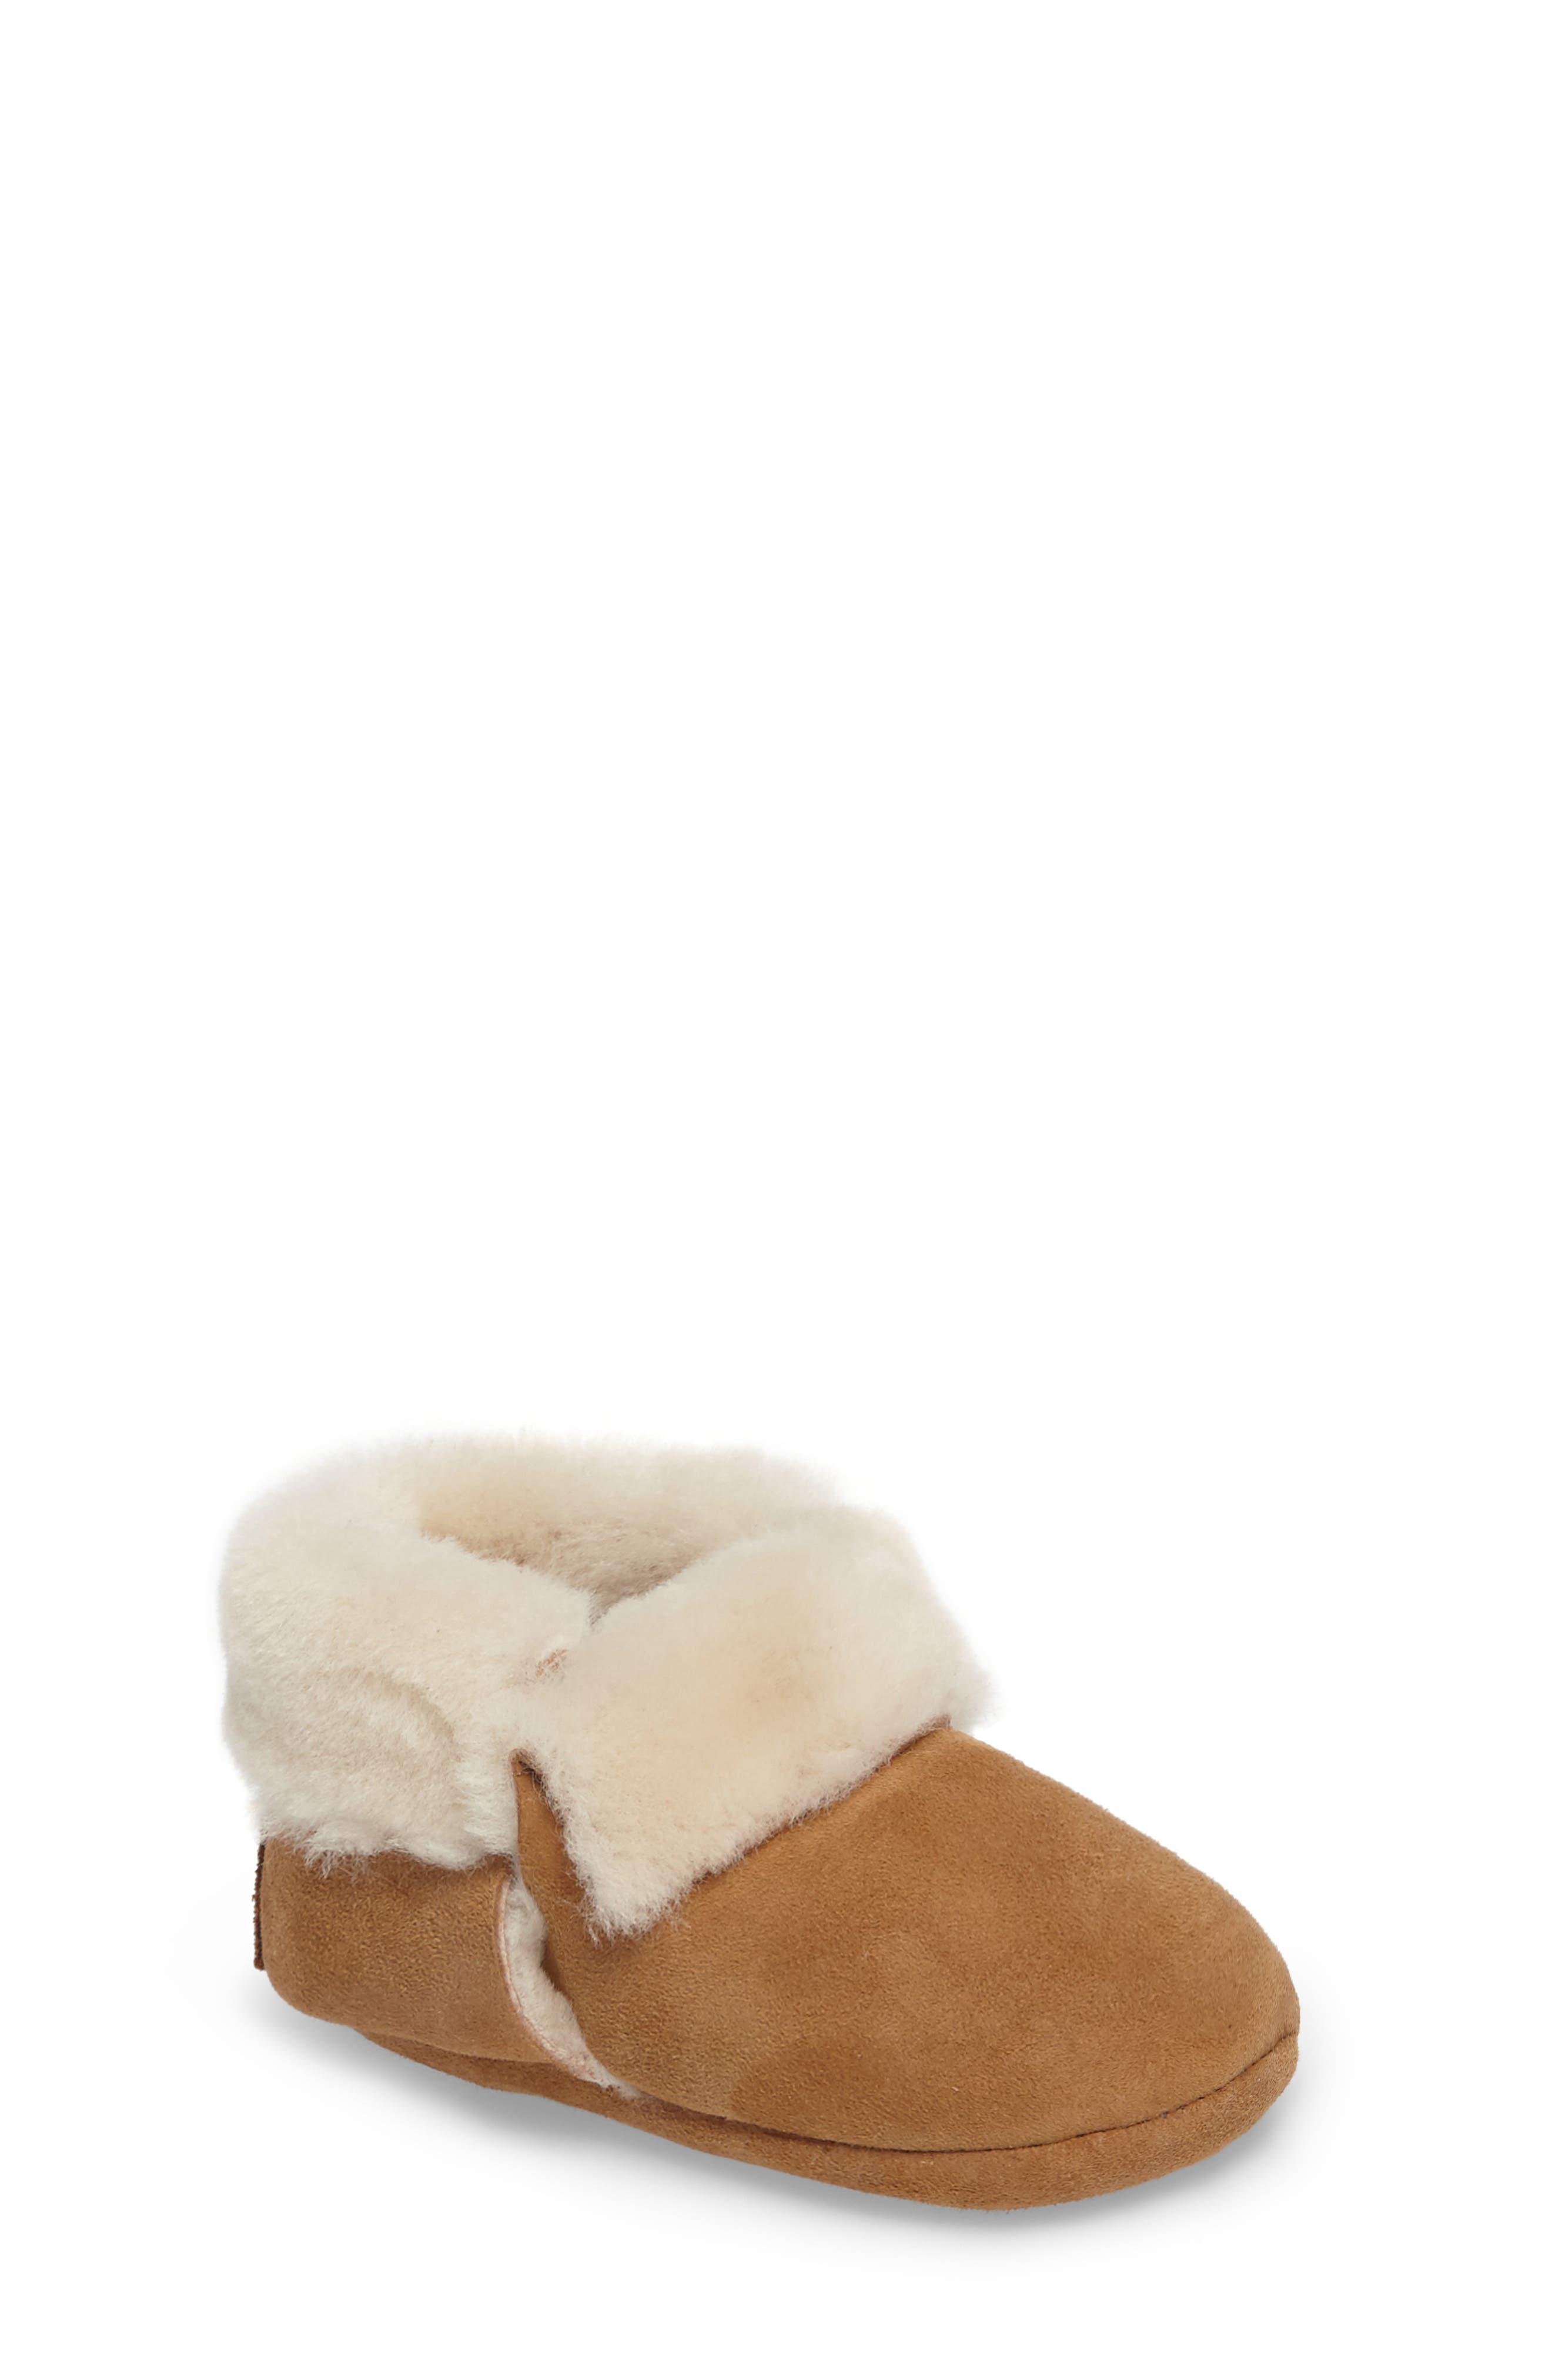 Solvi Genuine Shearling Low Cuffed Bootie,                         Main,                         color, 200